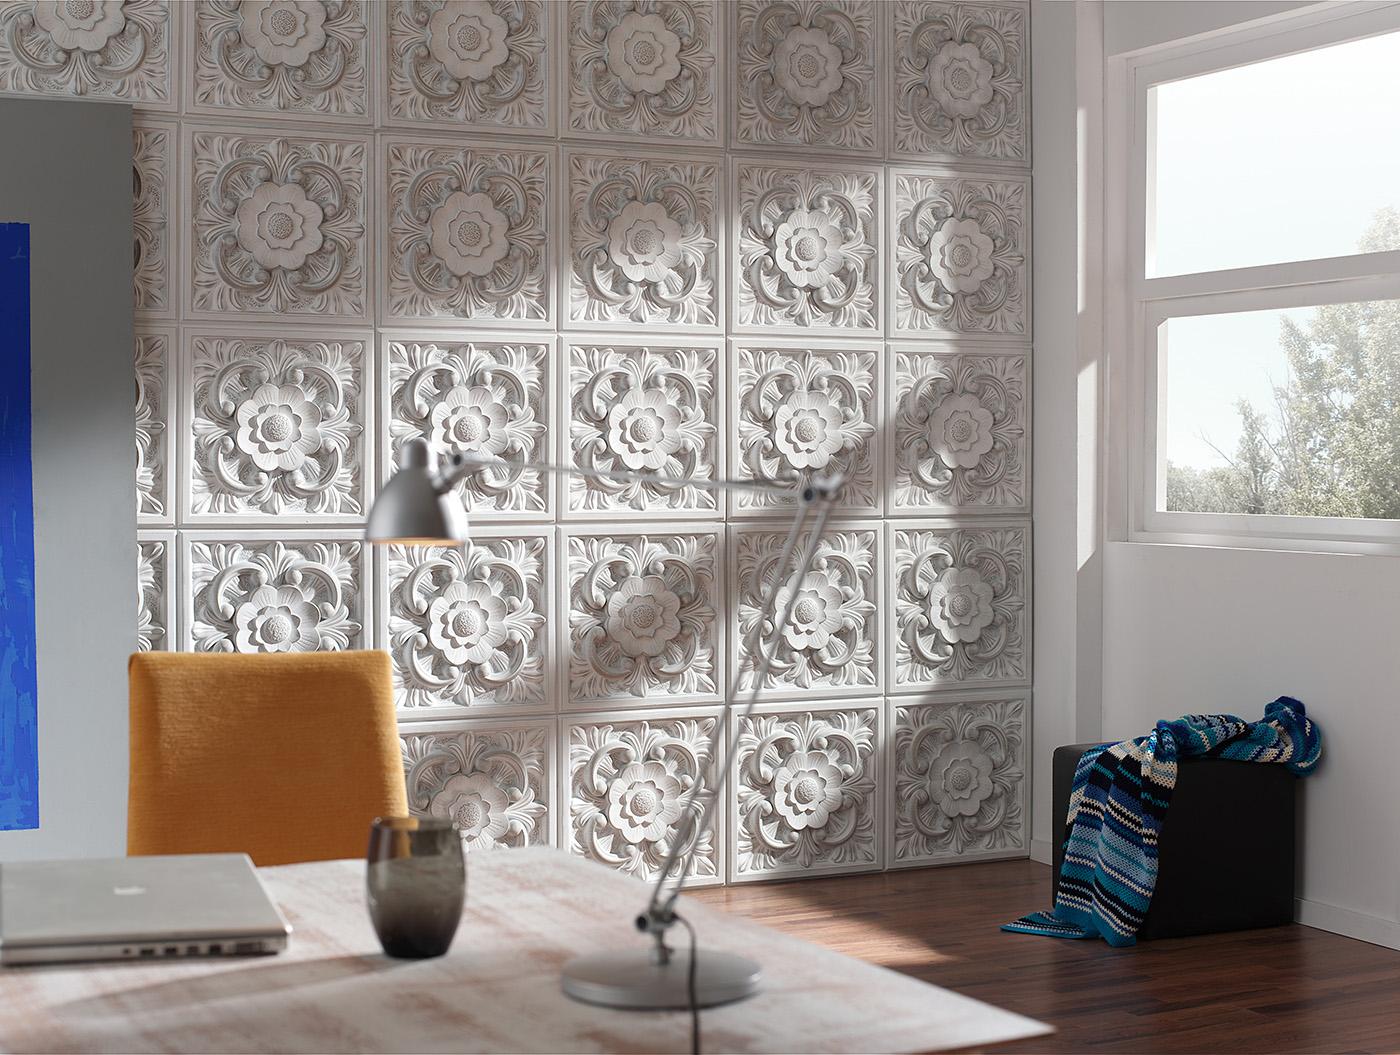 3d Brick Wallpaper For Walls Panel Piedra Windsur Paneles Para Paredes Vintage